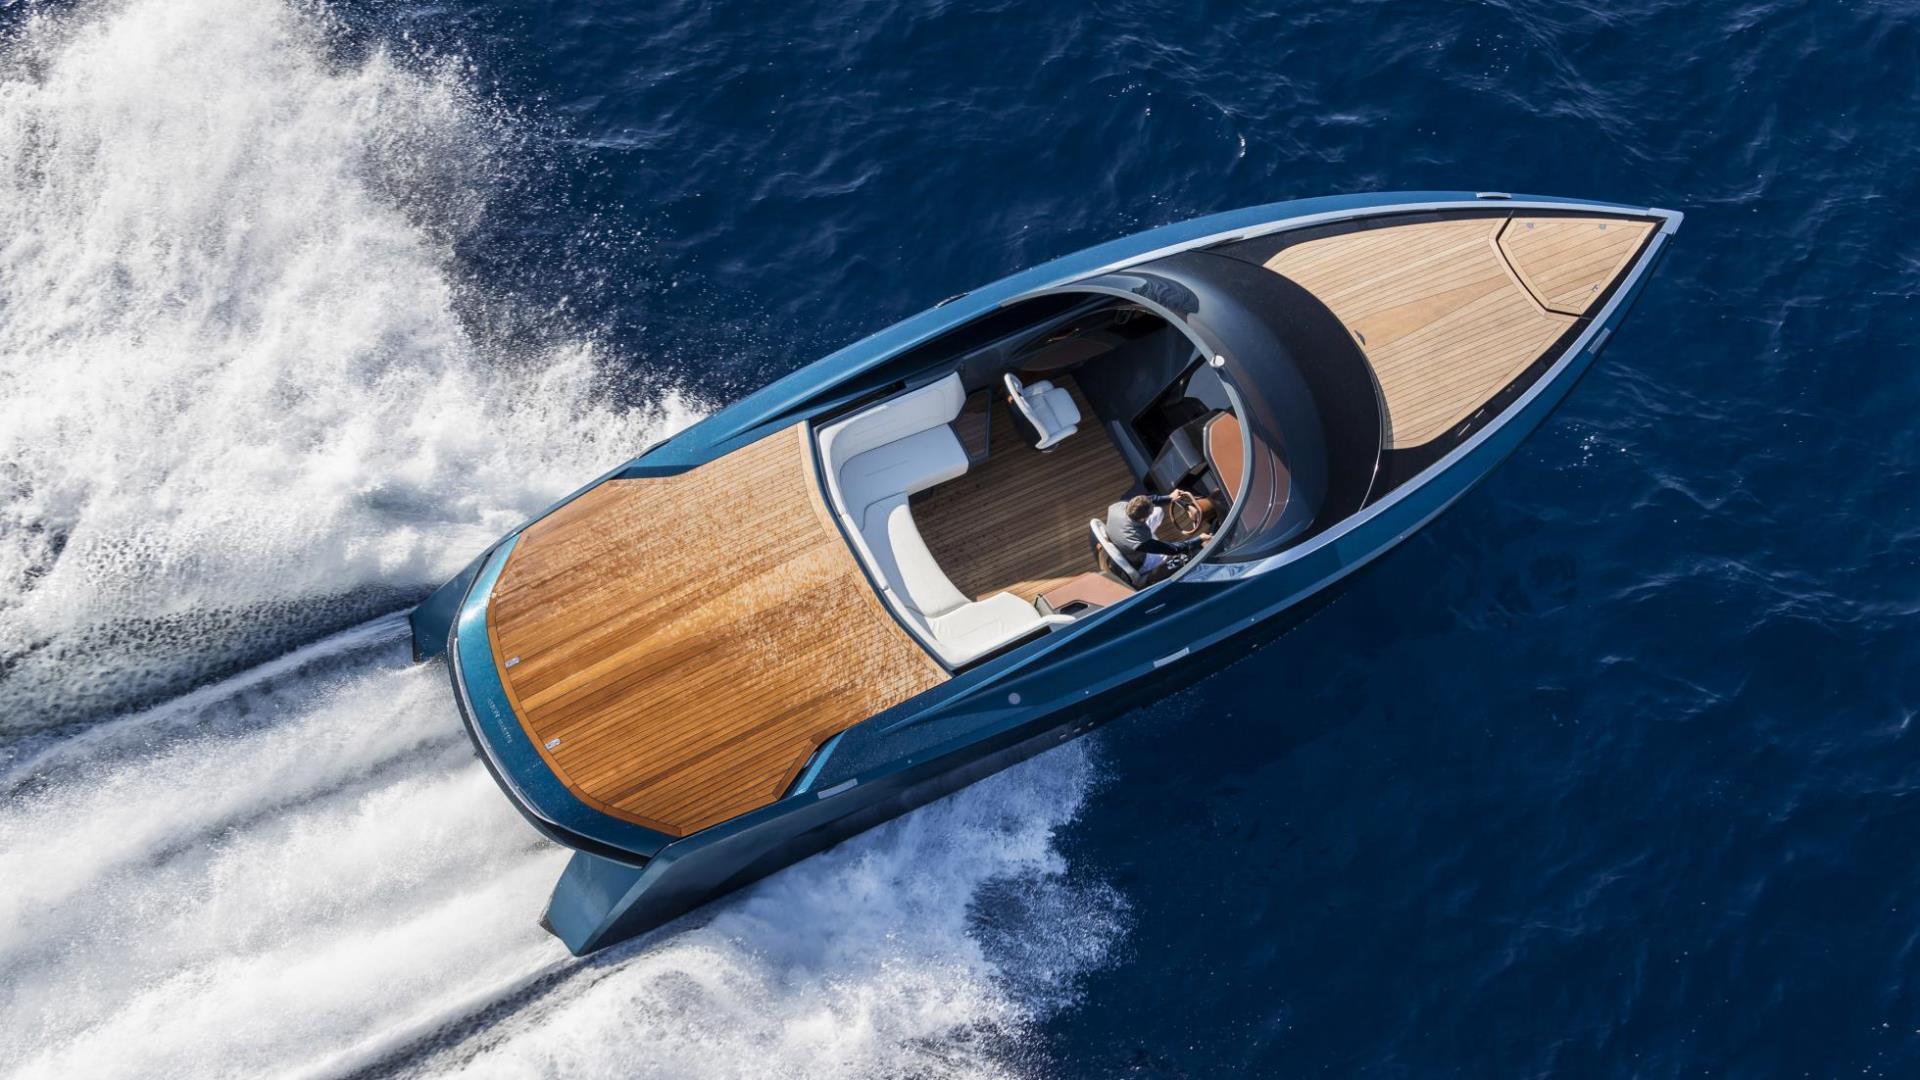 astonmartinpowerboat1